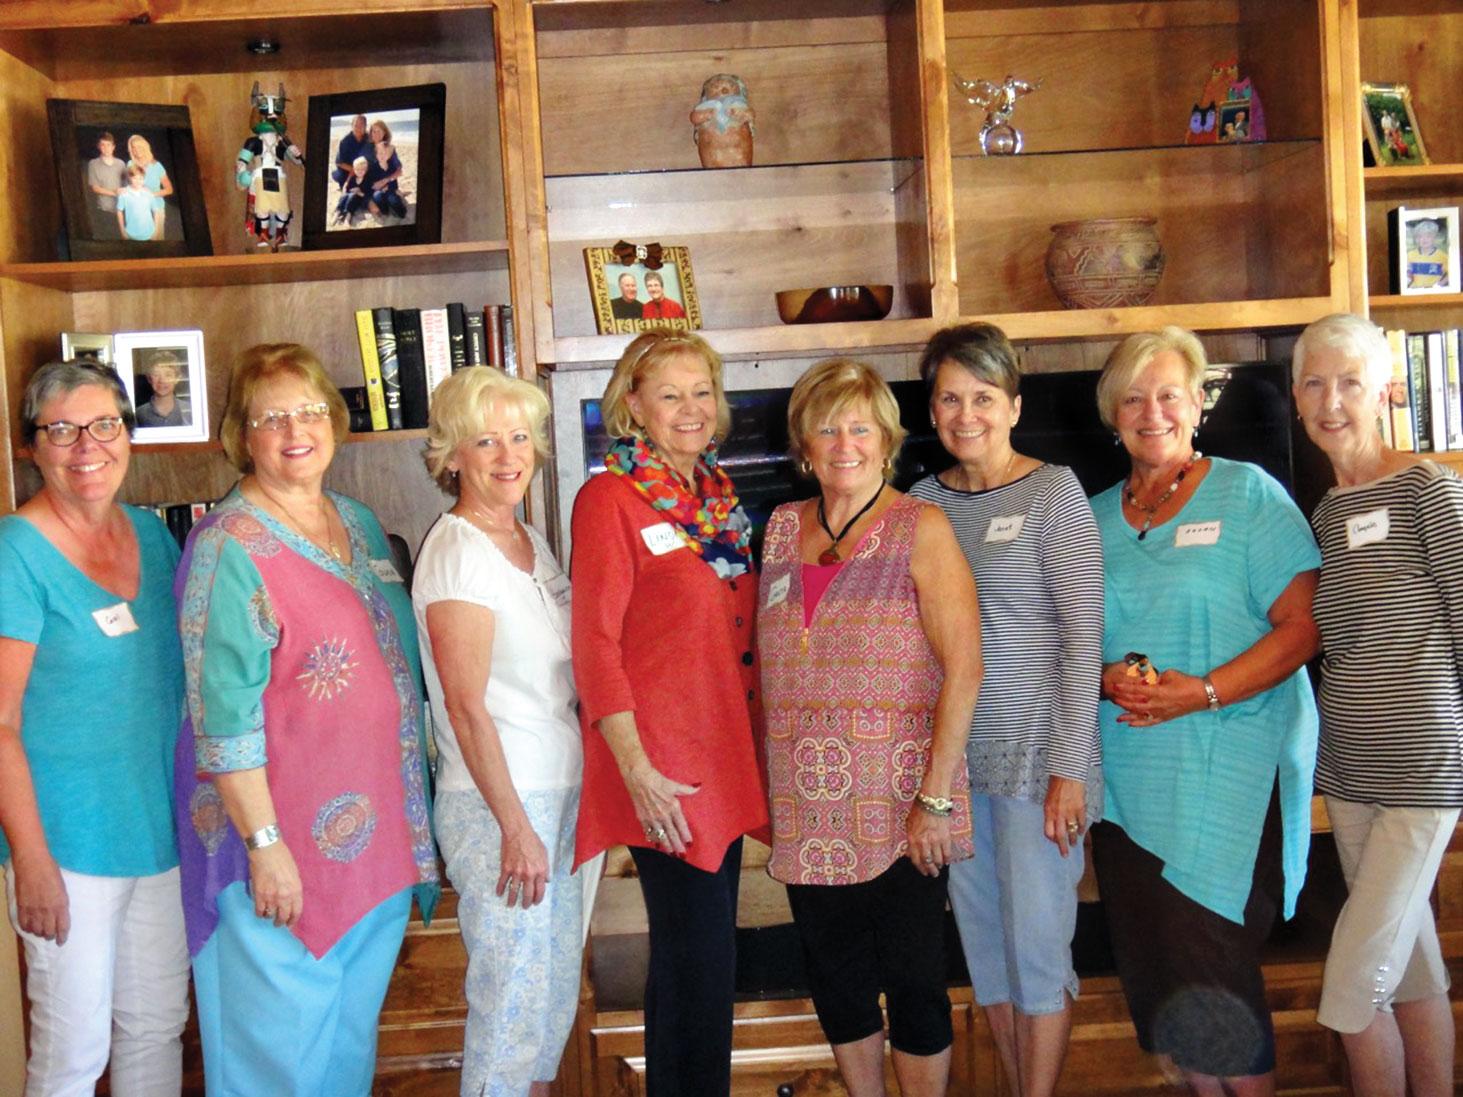 New members, left to right: Carol Thompson, Gwen Dossett, Georgeann Becker, Linda Whittington, Greta Von Wrangel, Janet Mastro, Susan Mason and Angela Gothard